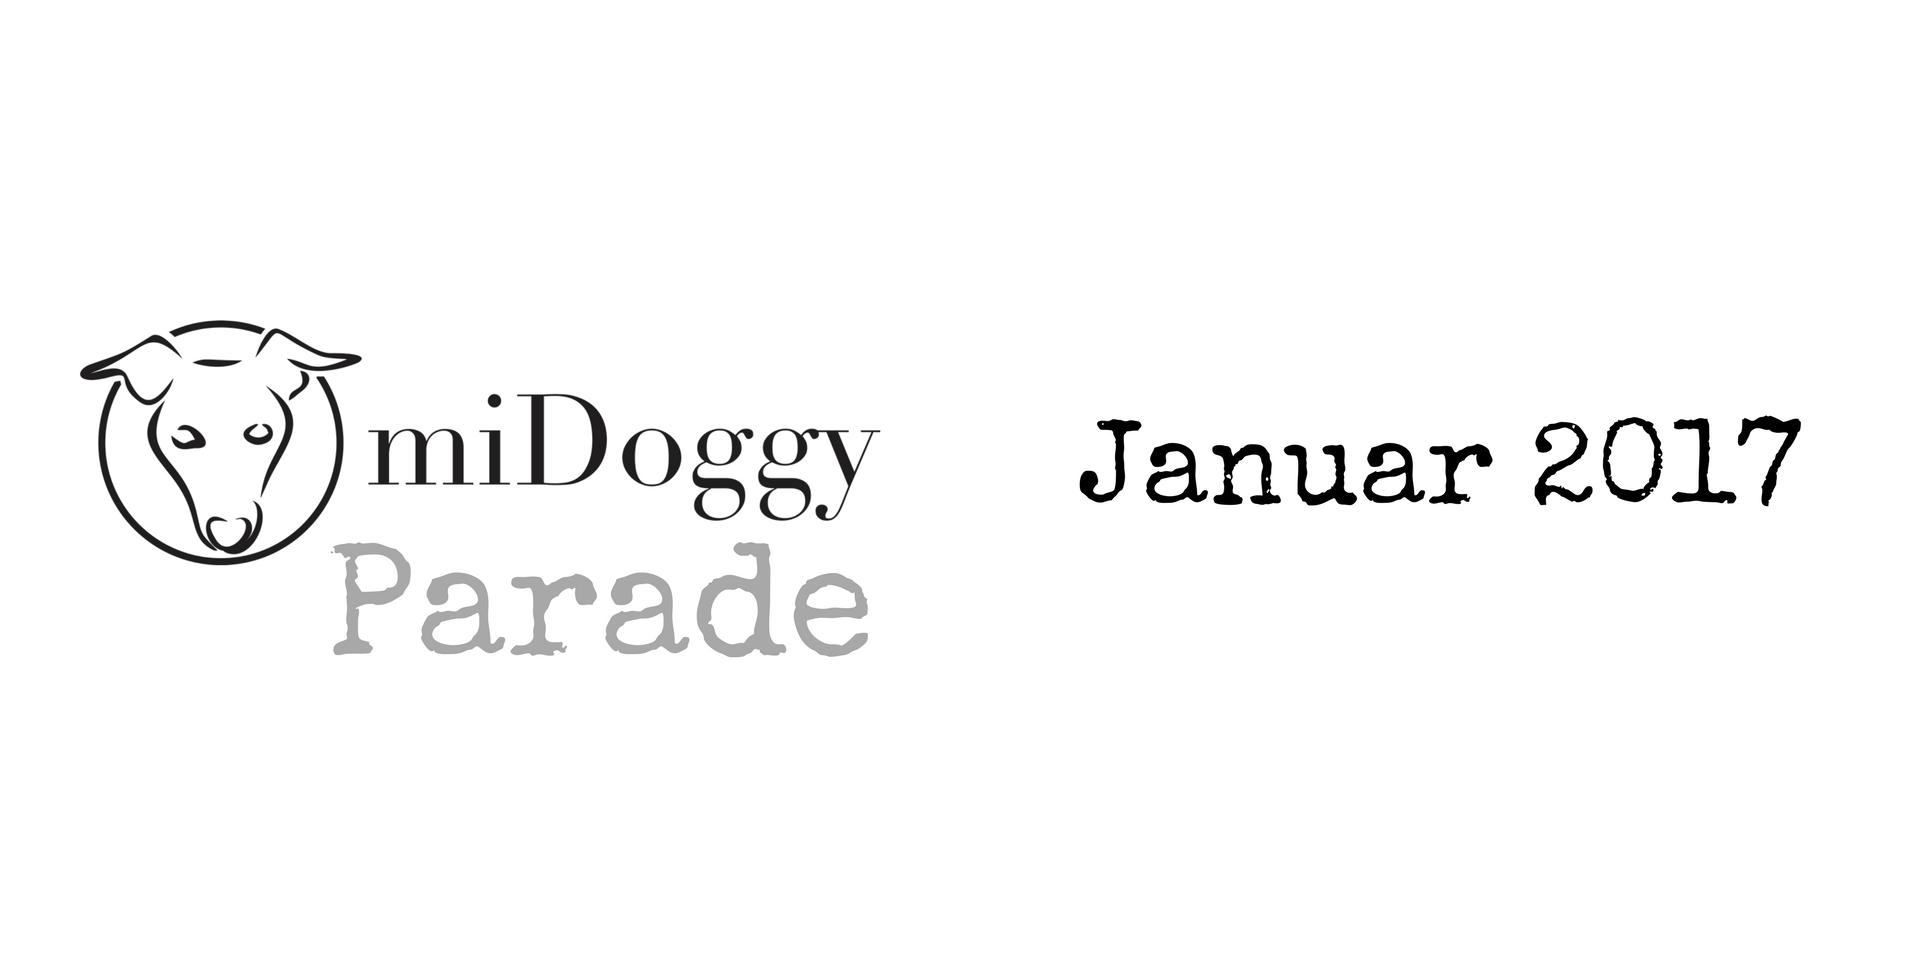 miDoggy Parade Blogparade Hundeblogger Januar 2017